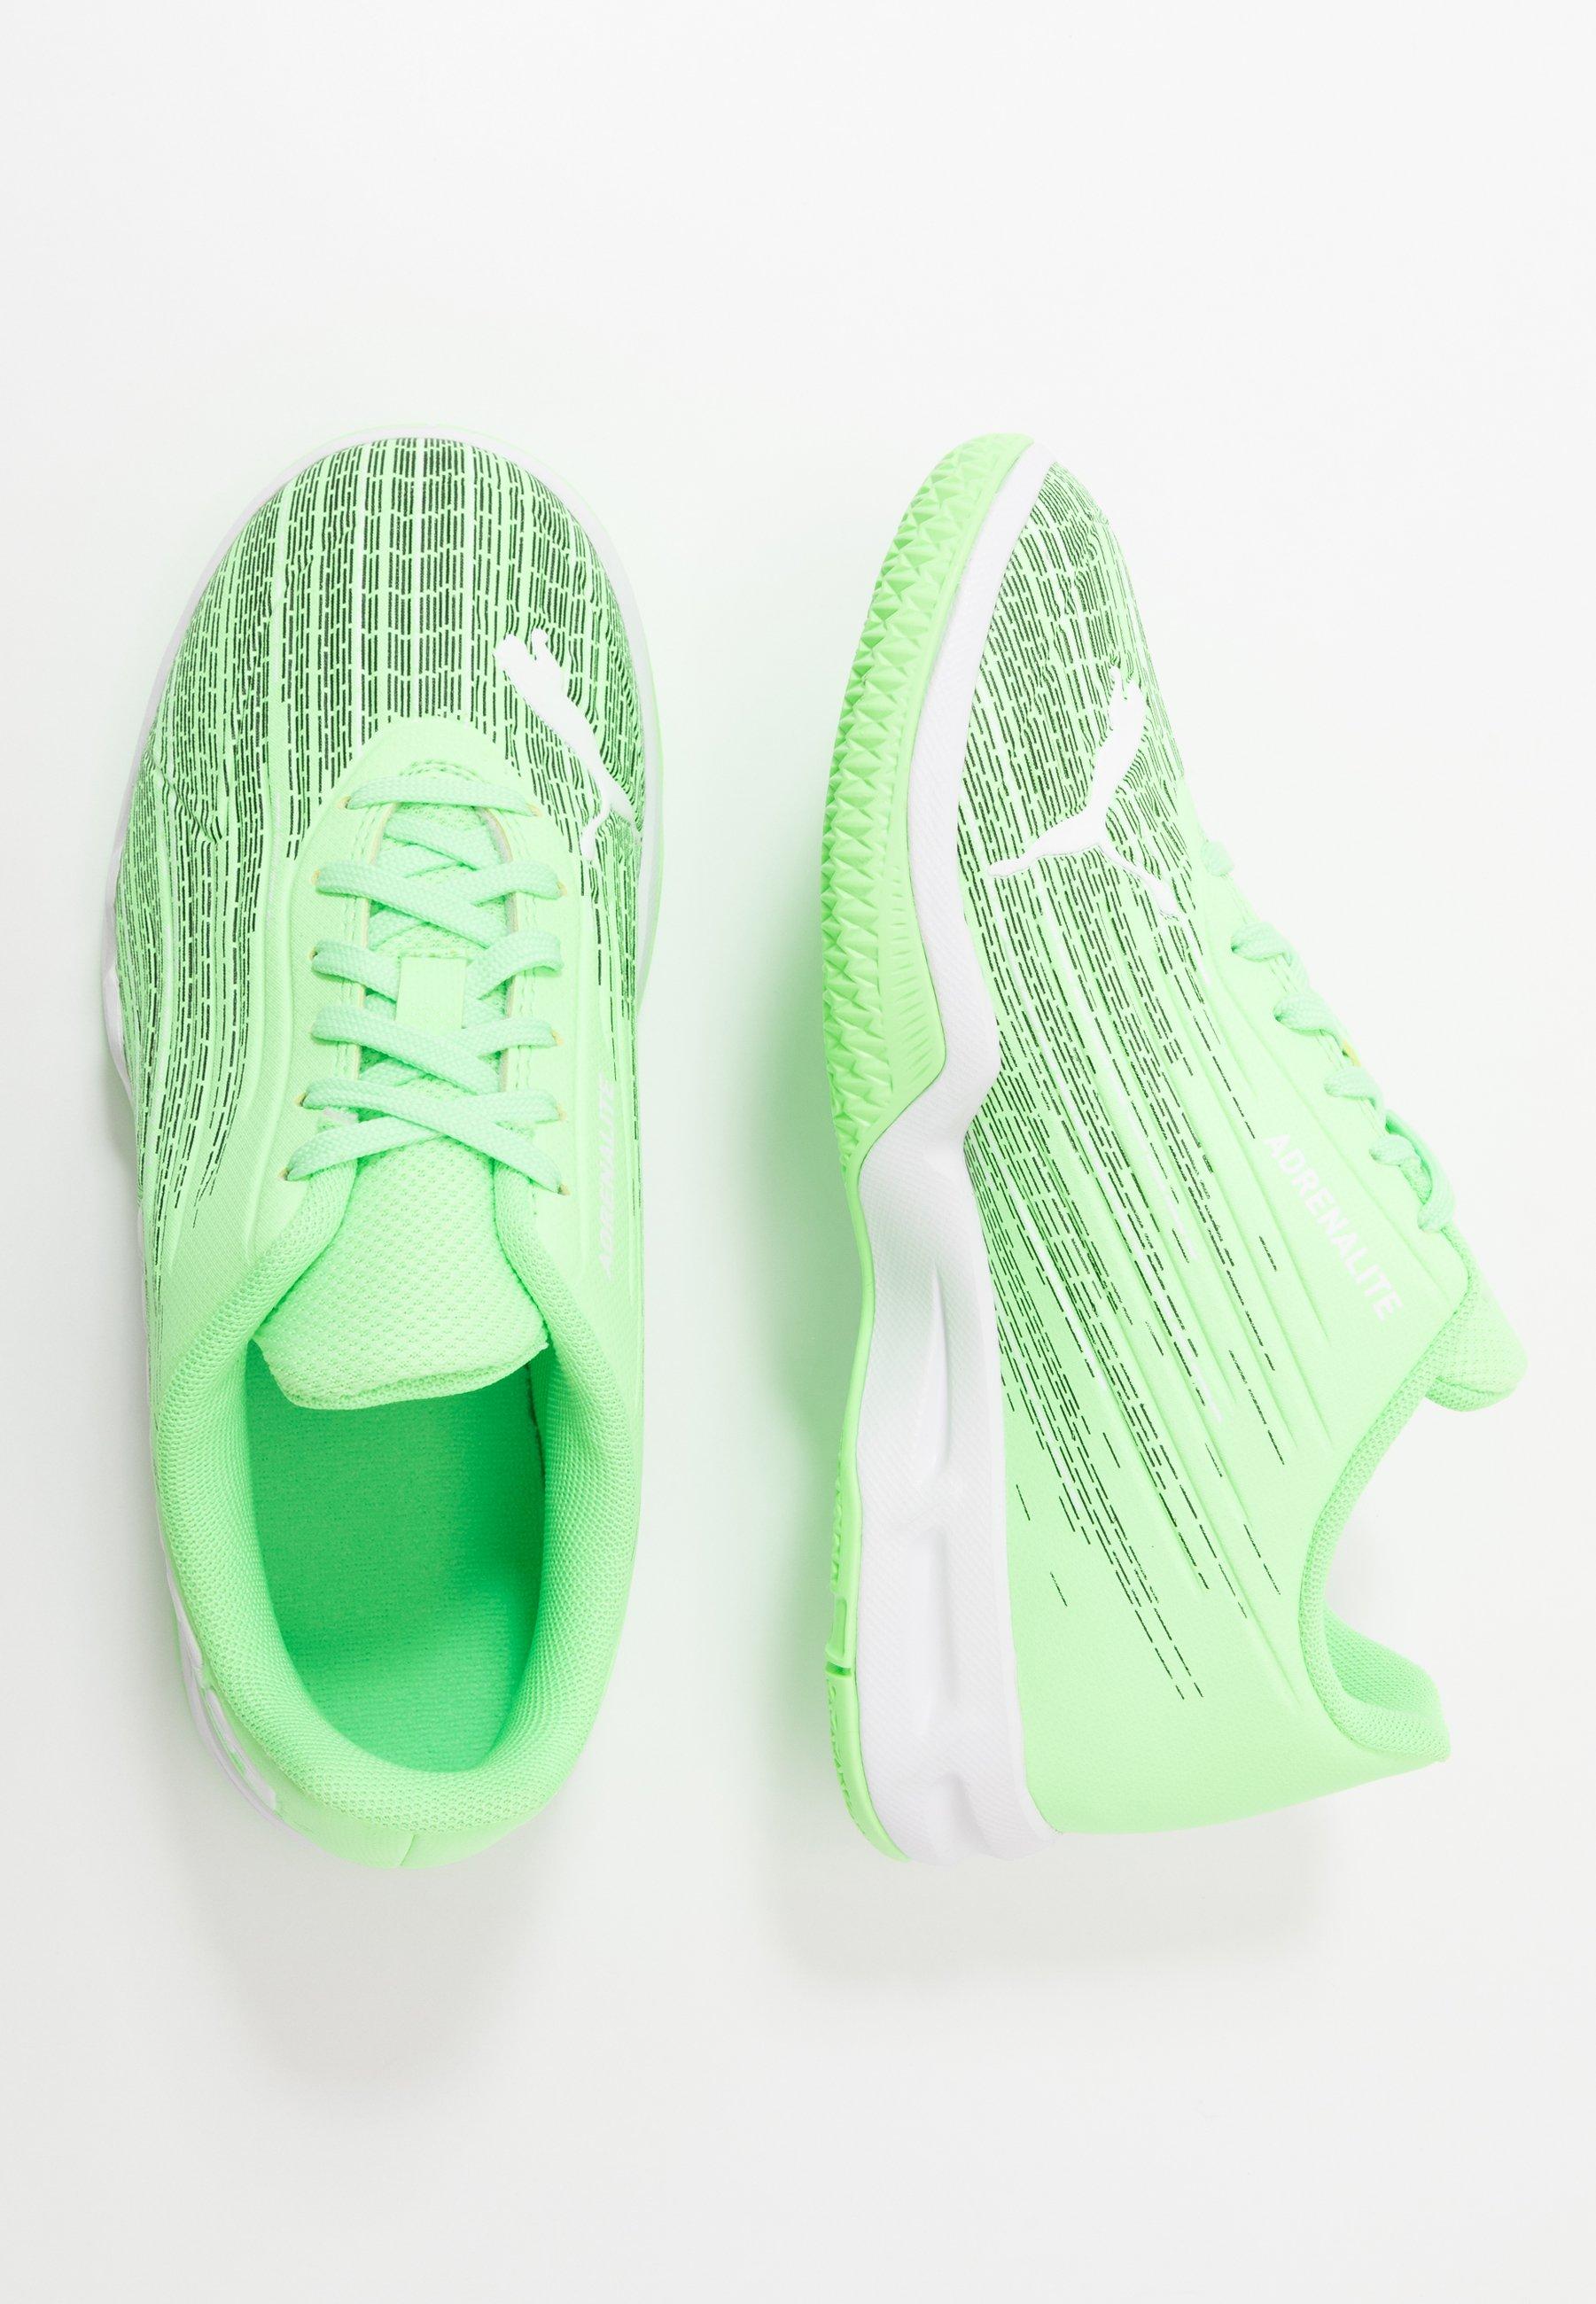 Soltero Leche Inicialmente  Puma ADRENALITE 4.1 - Zapatillas de balonmano - elektro green/white/verde  neón - Zalando.es